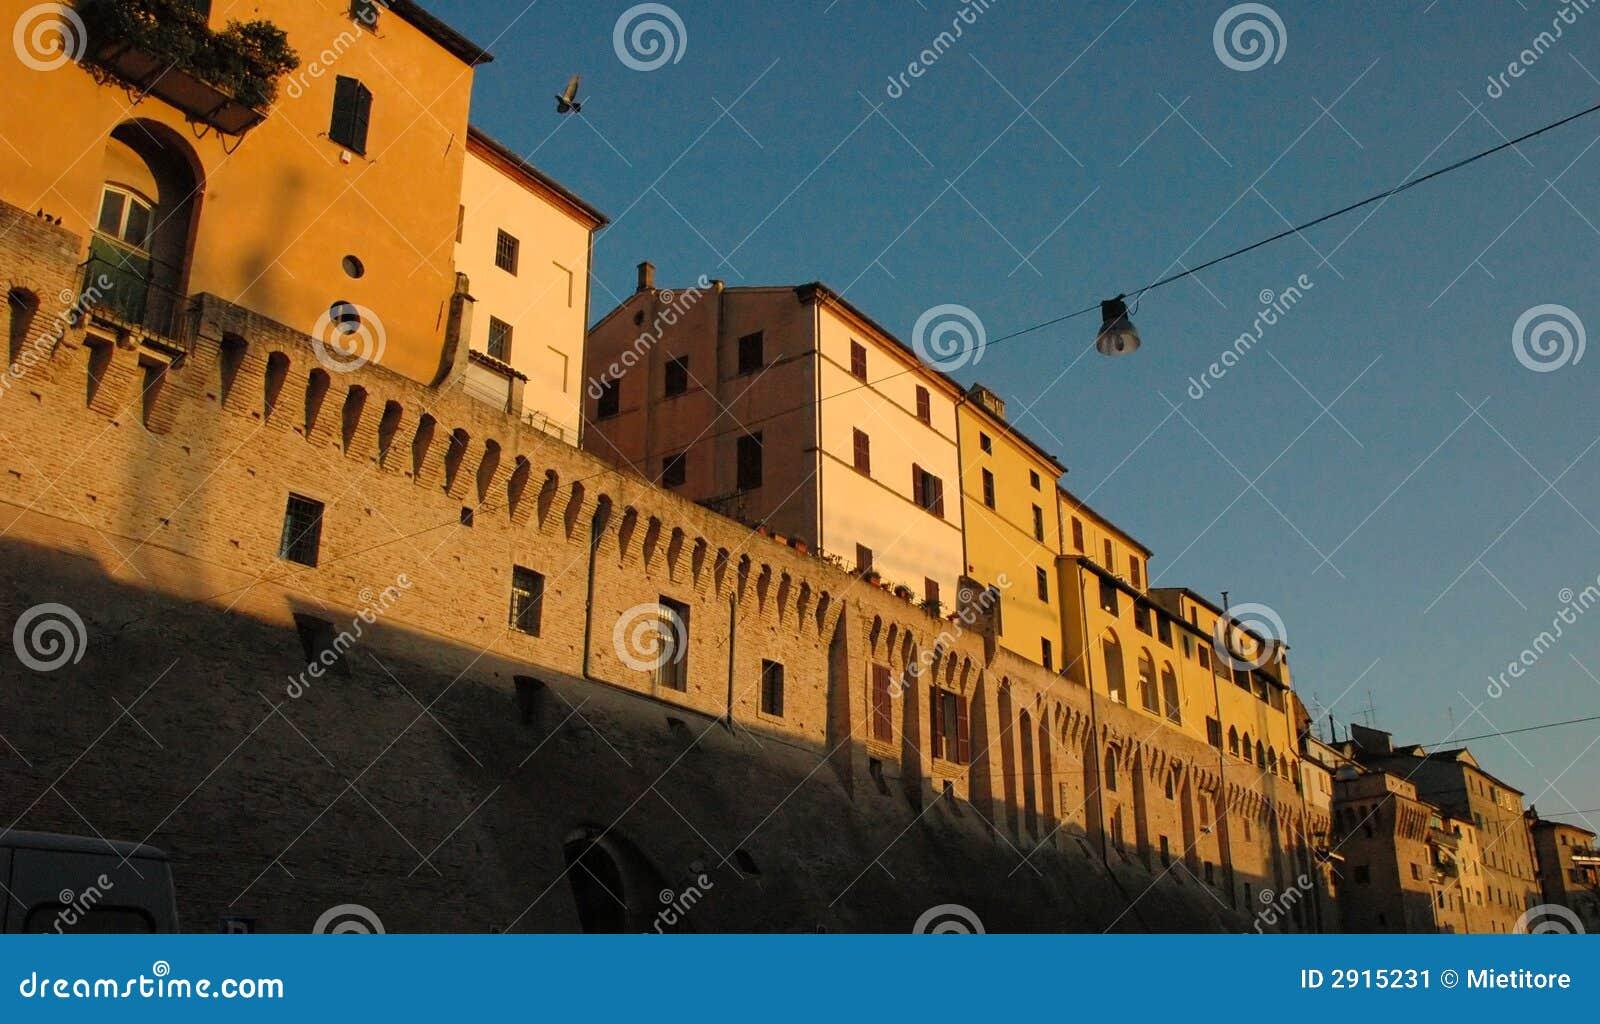 Download Jesi Walls stock image. Image of style, shopping, palace - 2915231